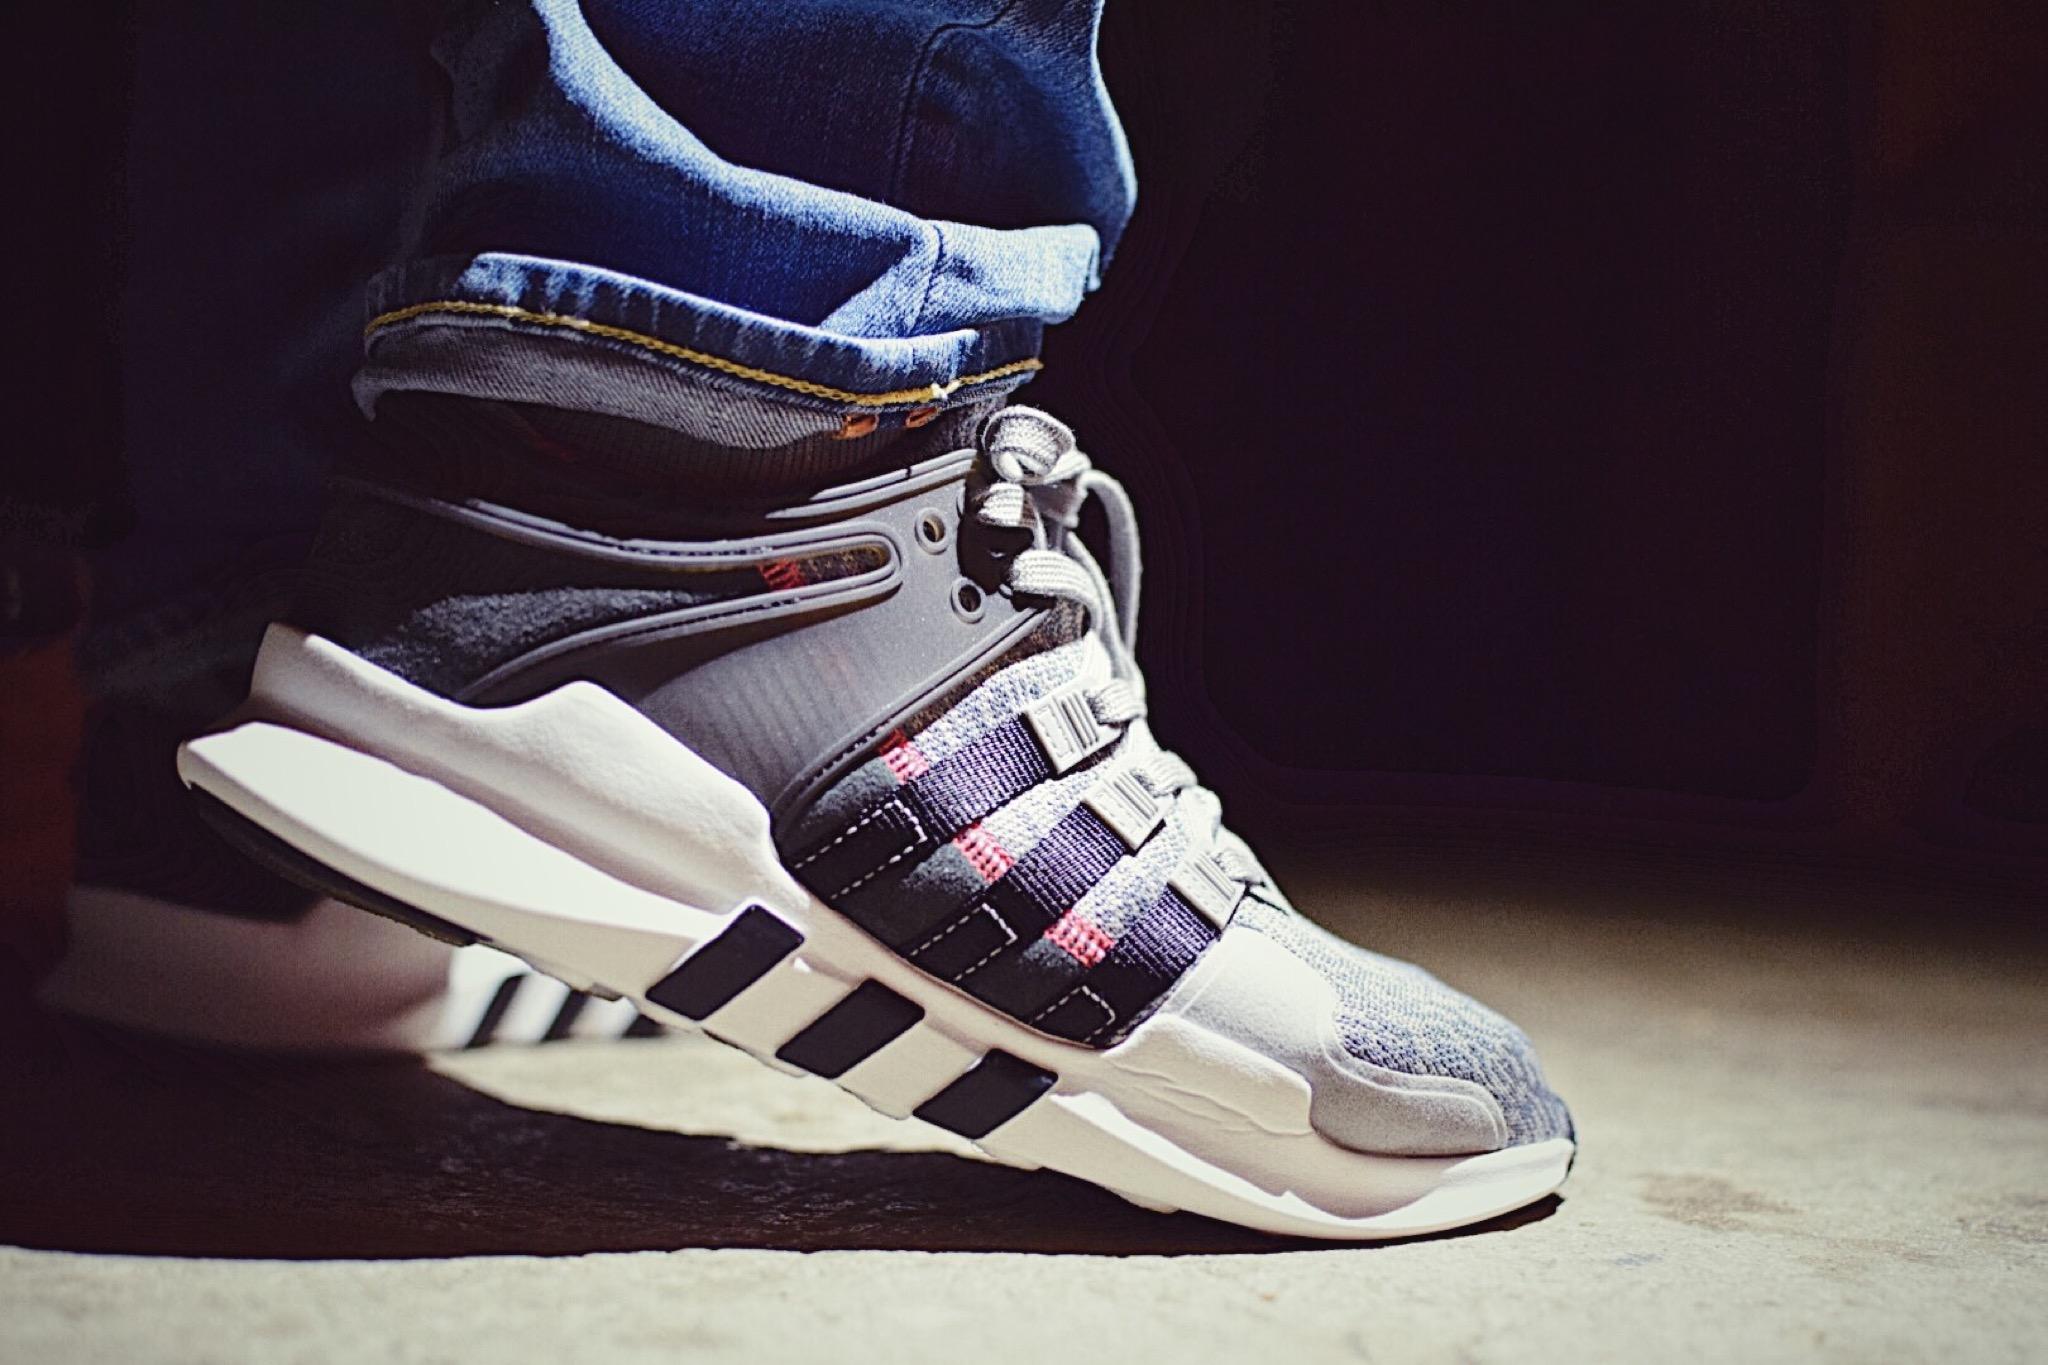 Foot Locker Adidas EQT ADV913A37C1-5728-4BAD-B301-CC53C307E59C